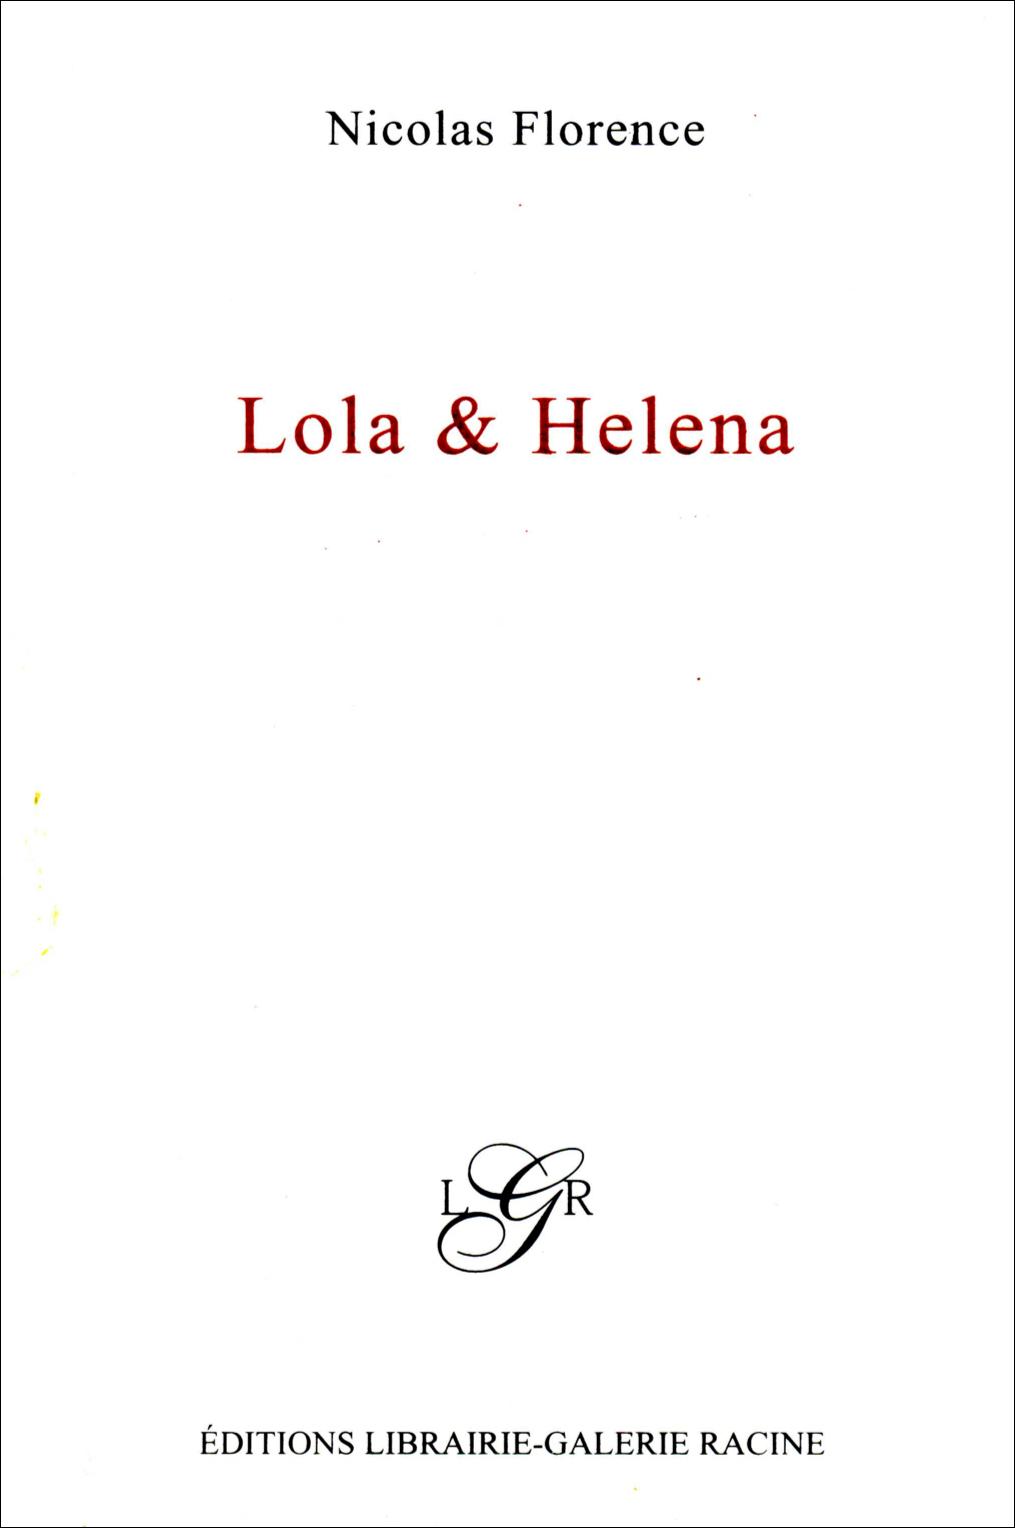 Nicolas Florence - Lola & Elena